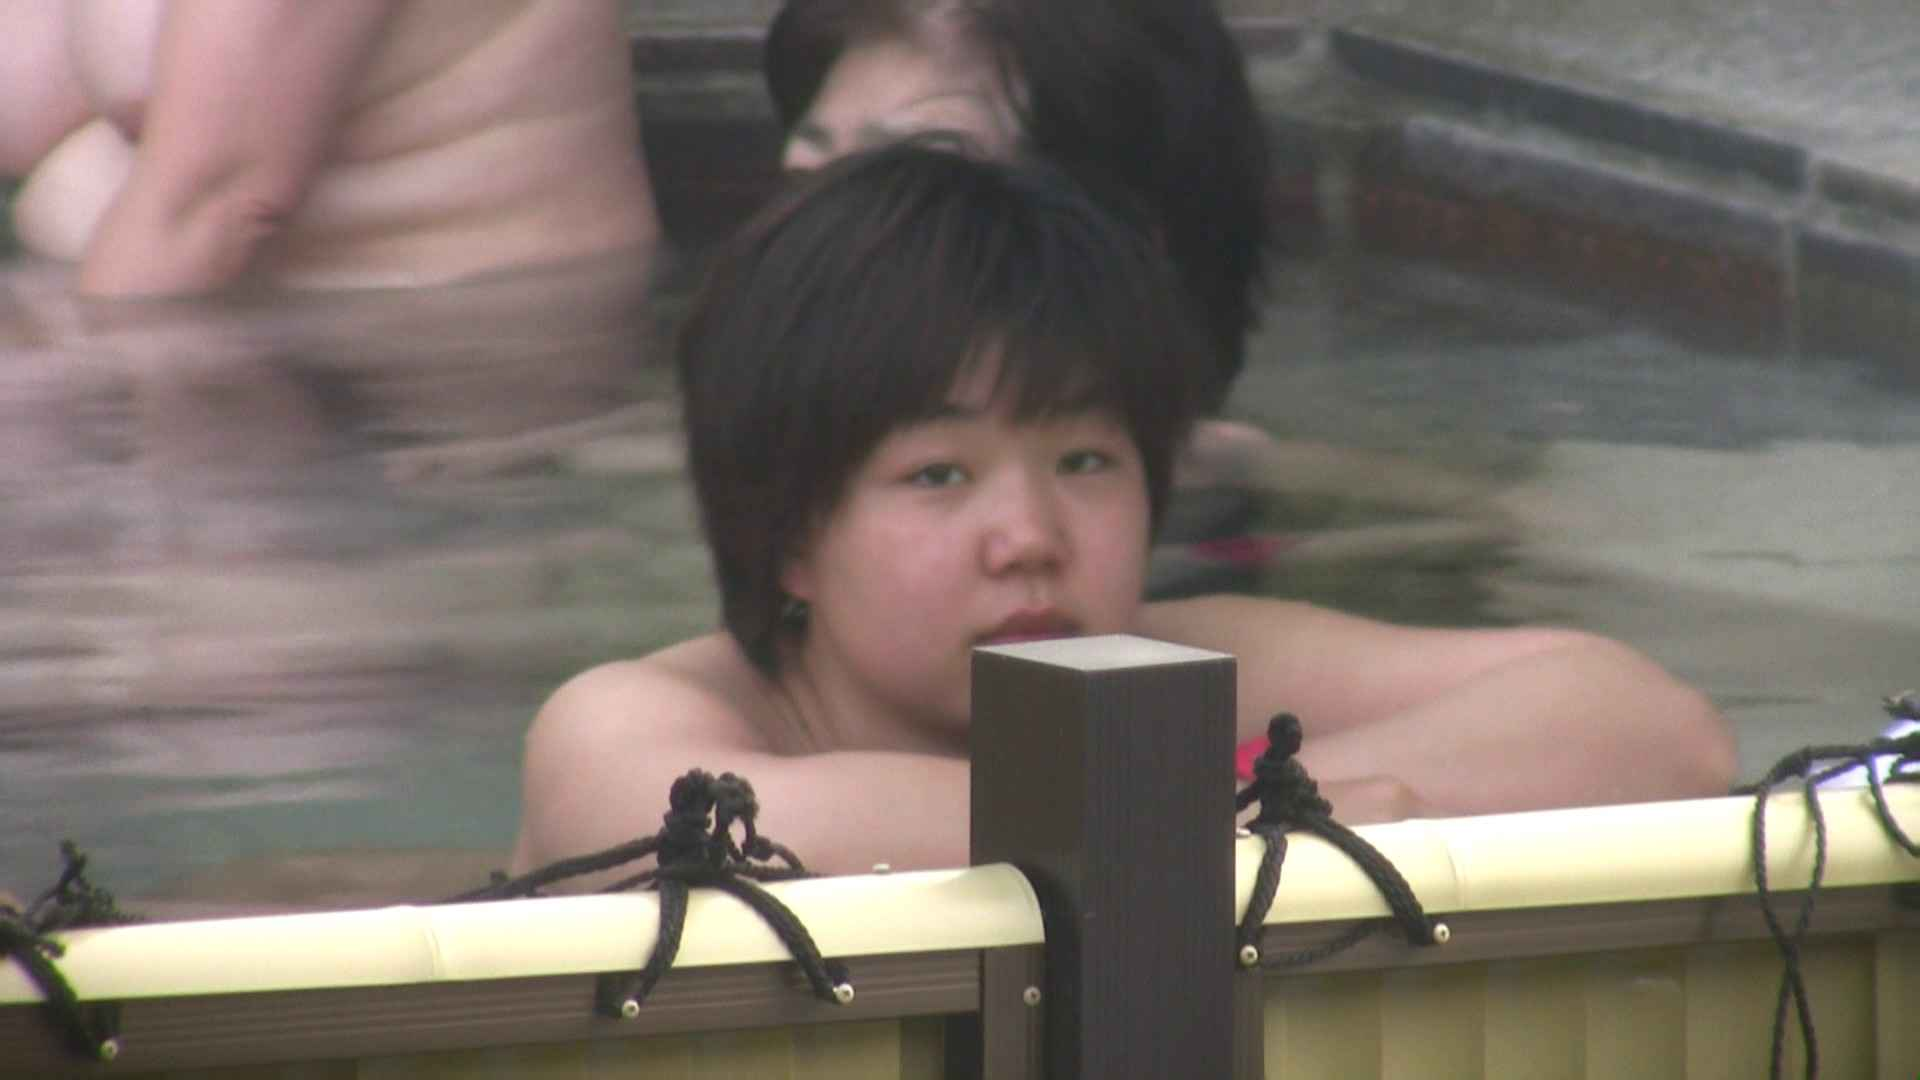 Aquaな露天風呂Vol.53【VIP限定】 盗撮師作品 おまんこ動画流出 78pic 44